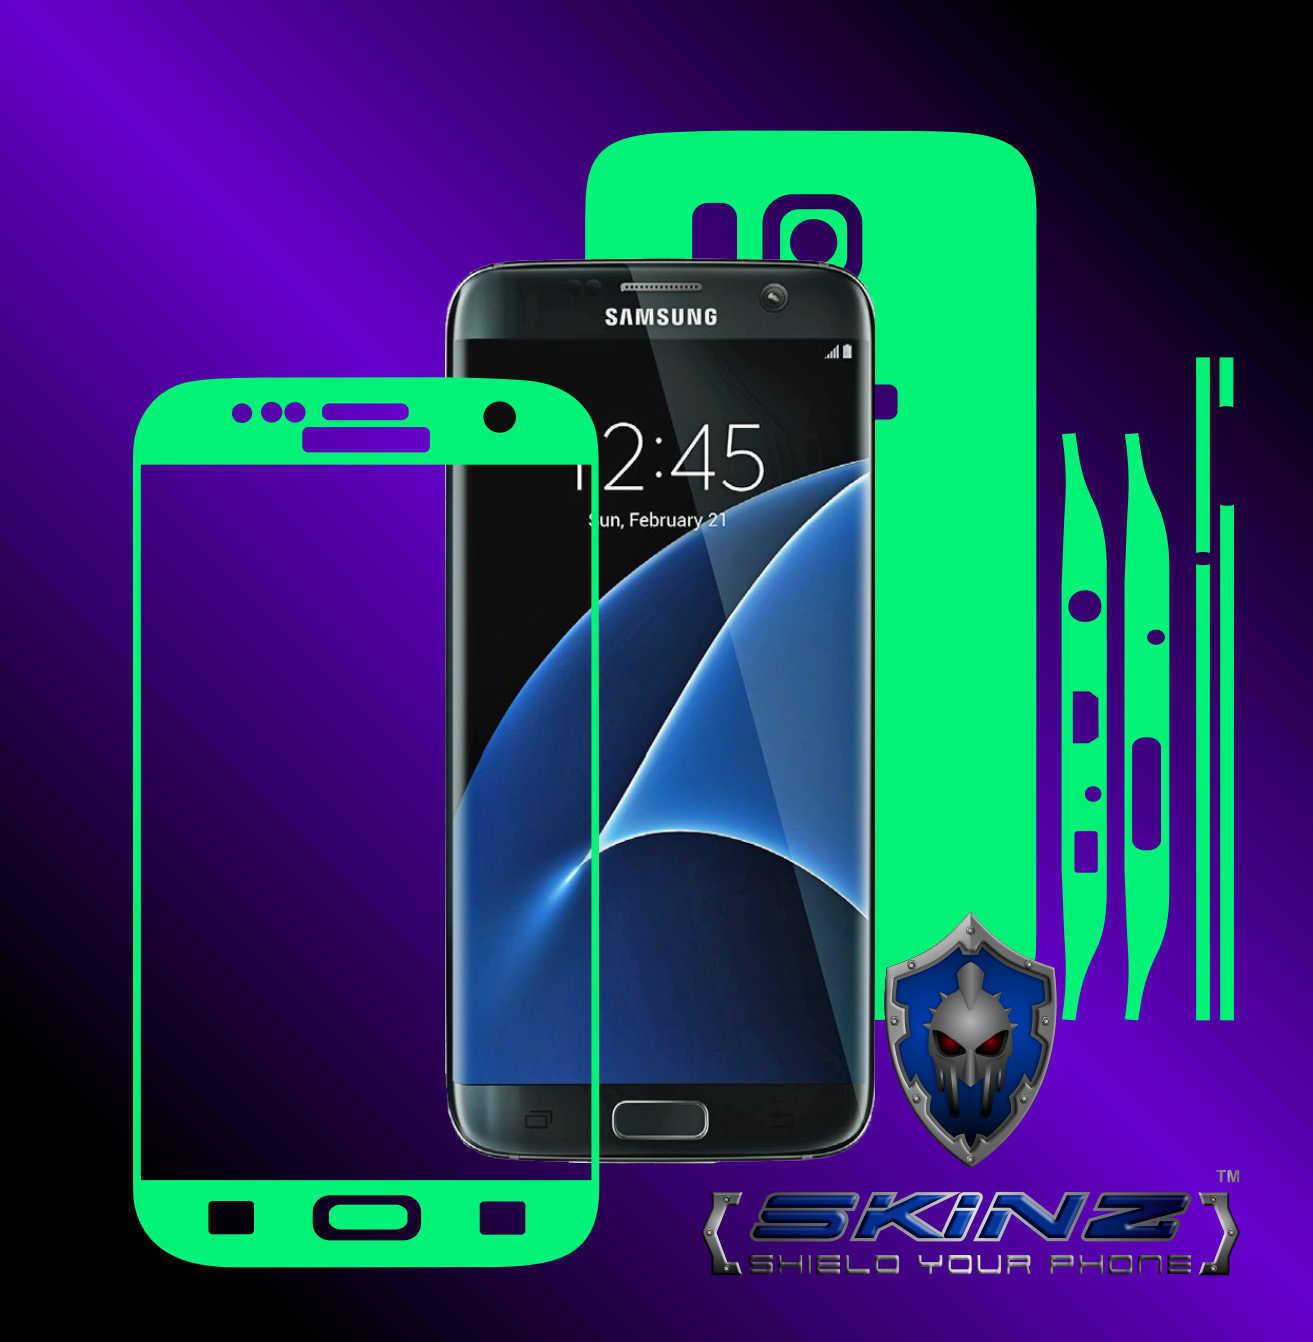 Samsung galaxy s7 edge glow in the dark full body skin